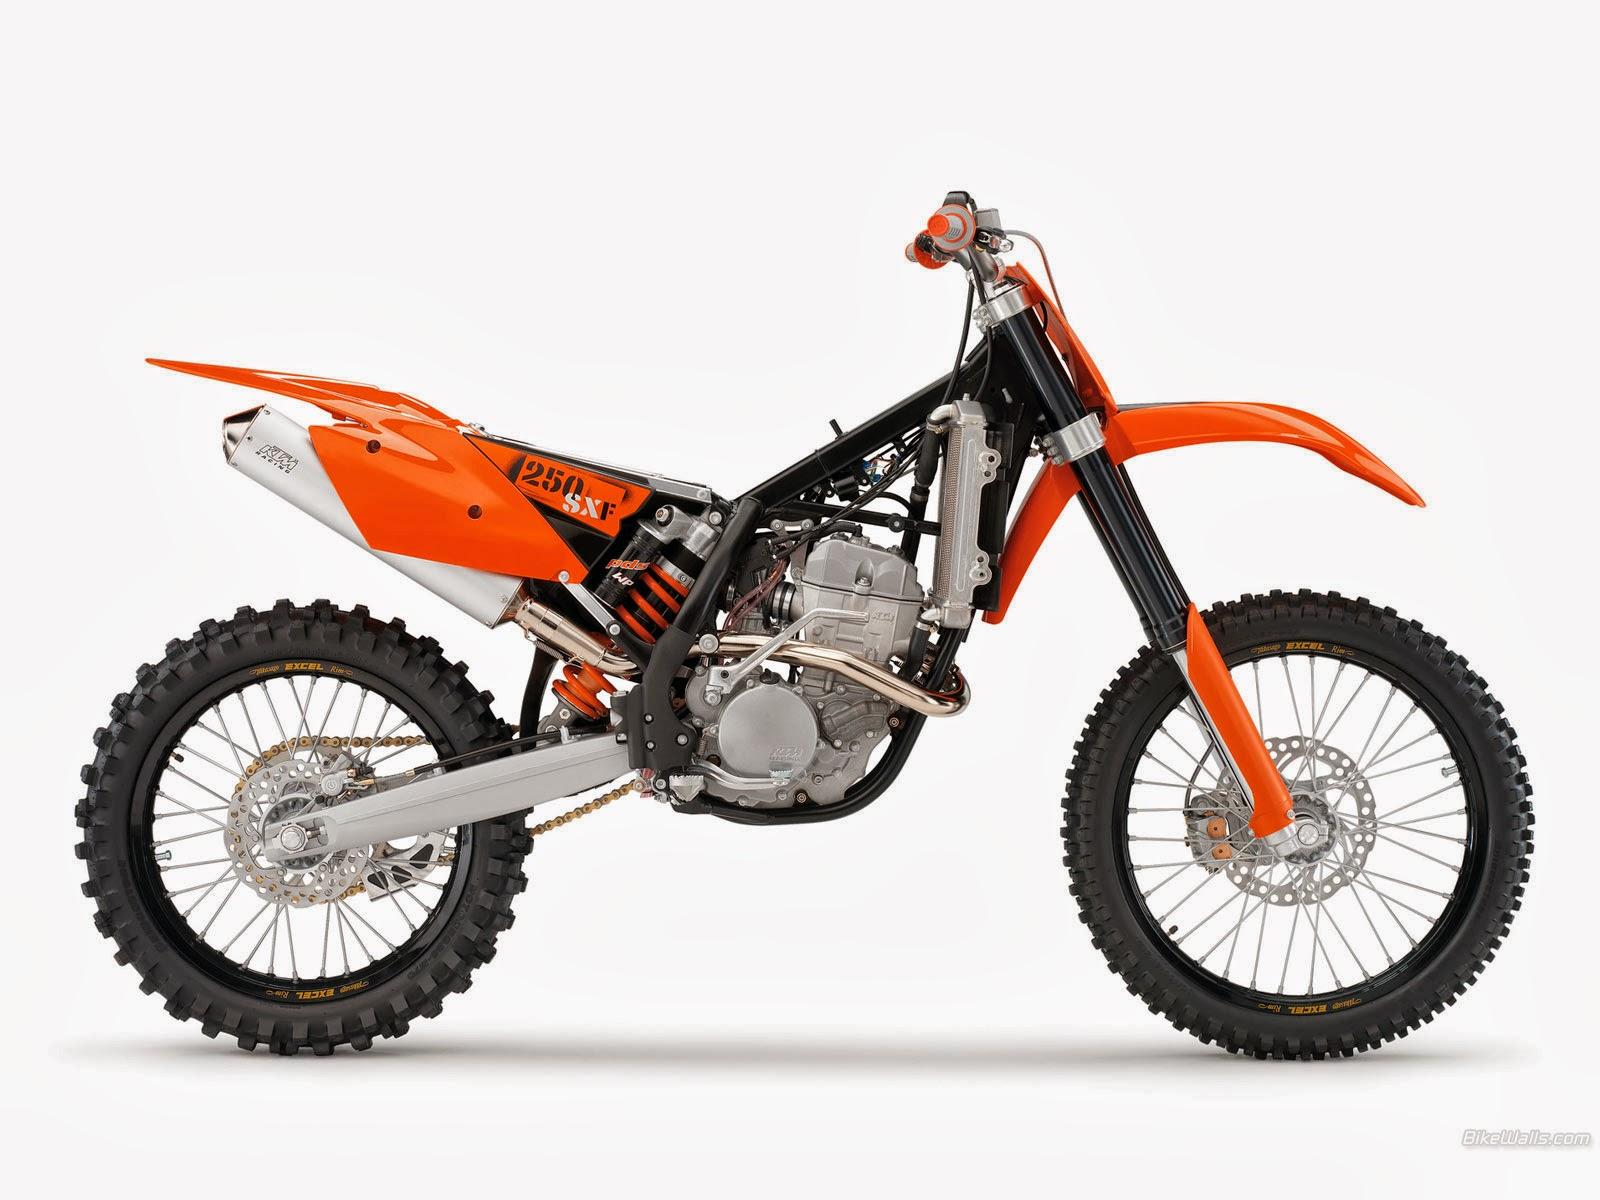 Ktm 250 Sx F Ktm Motor